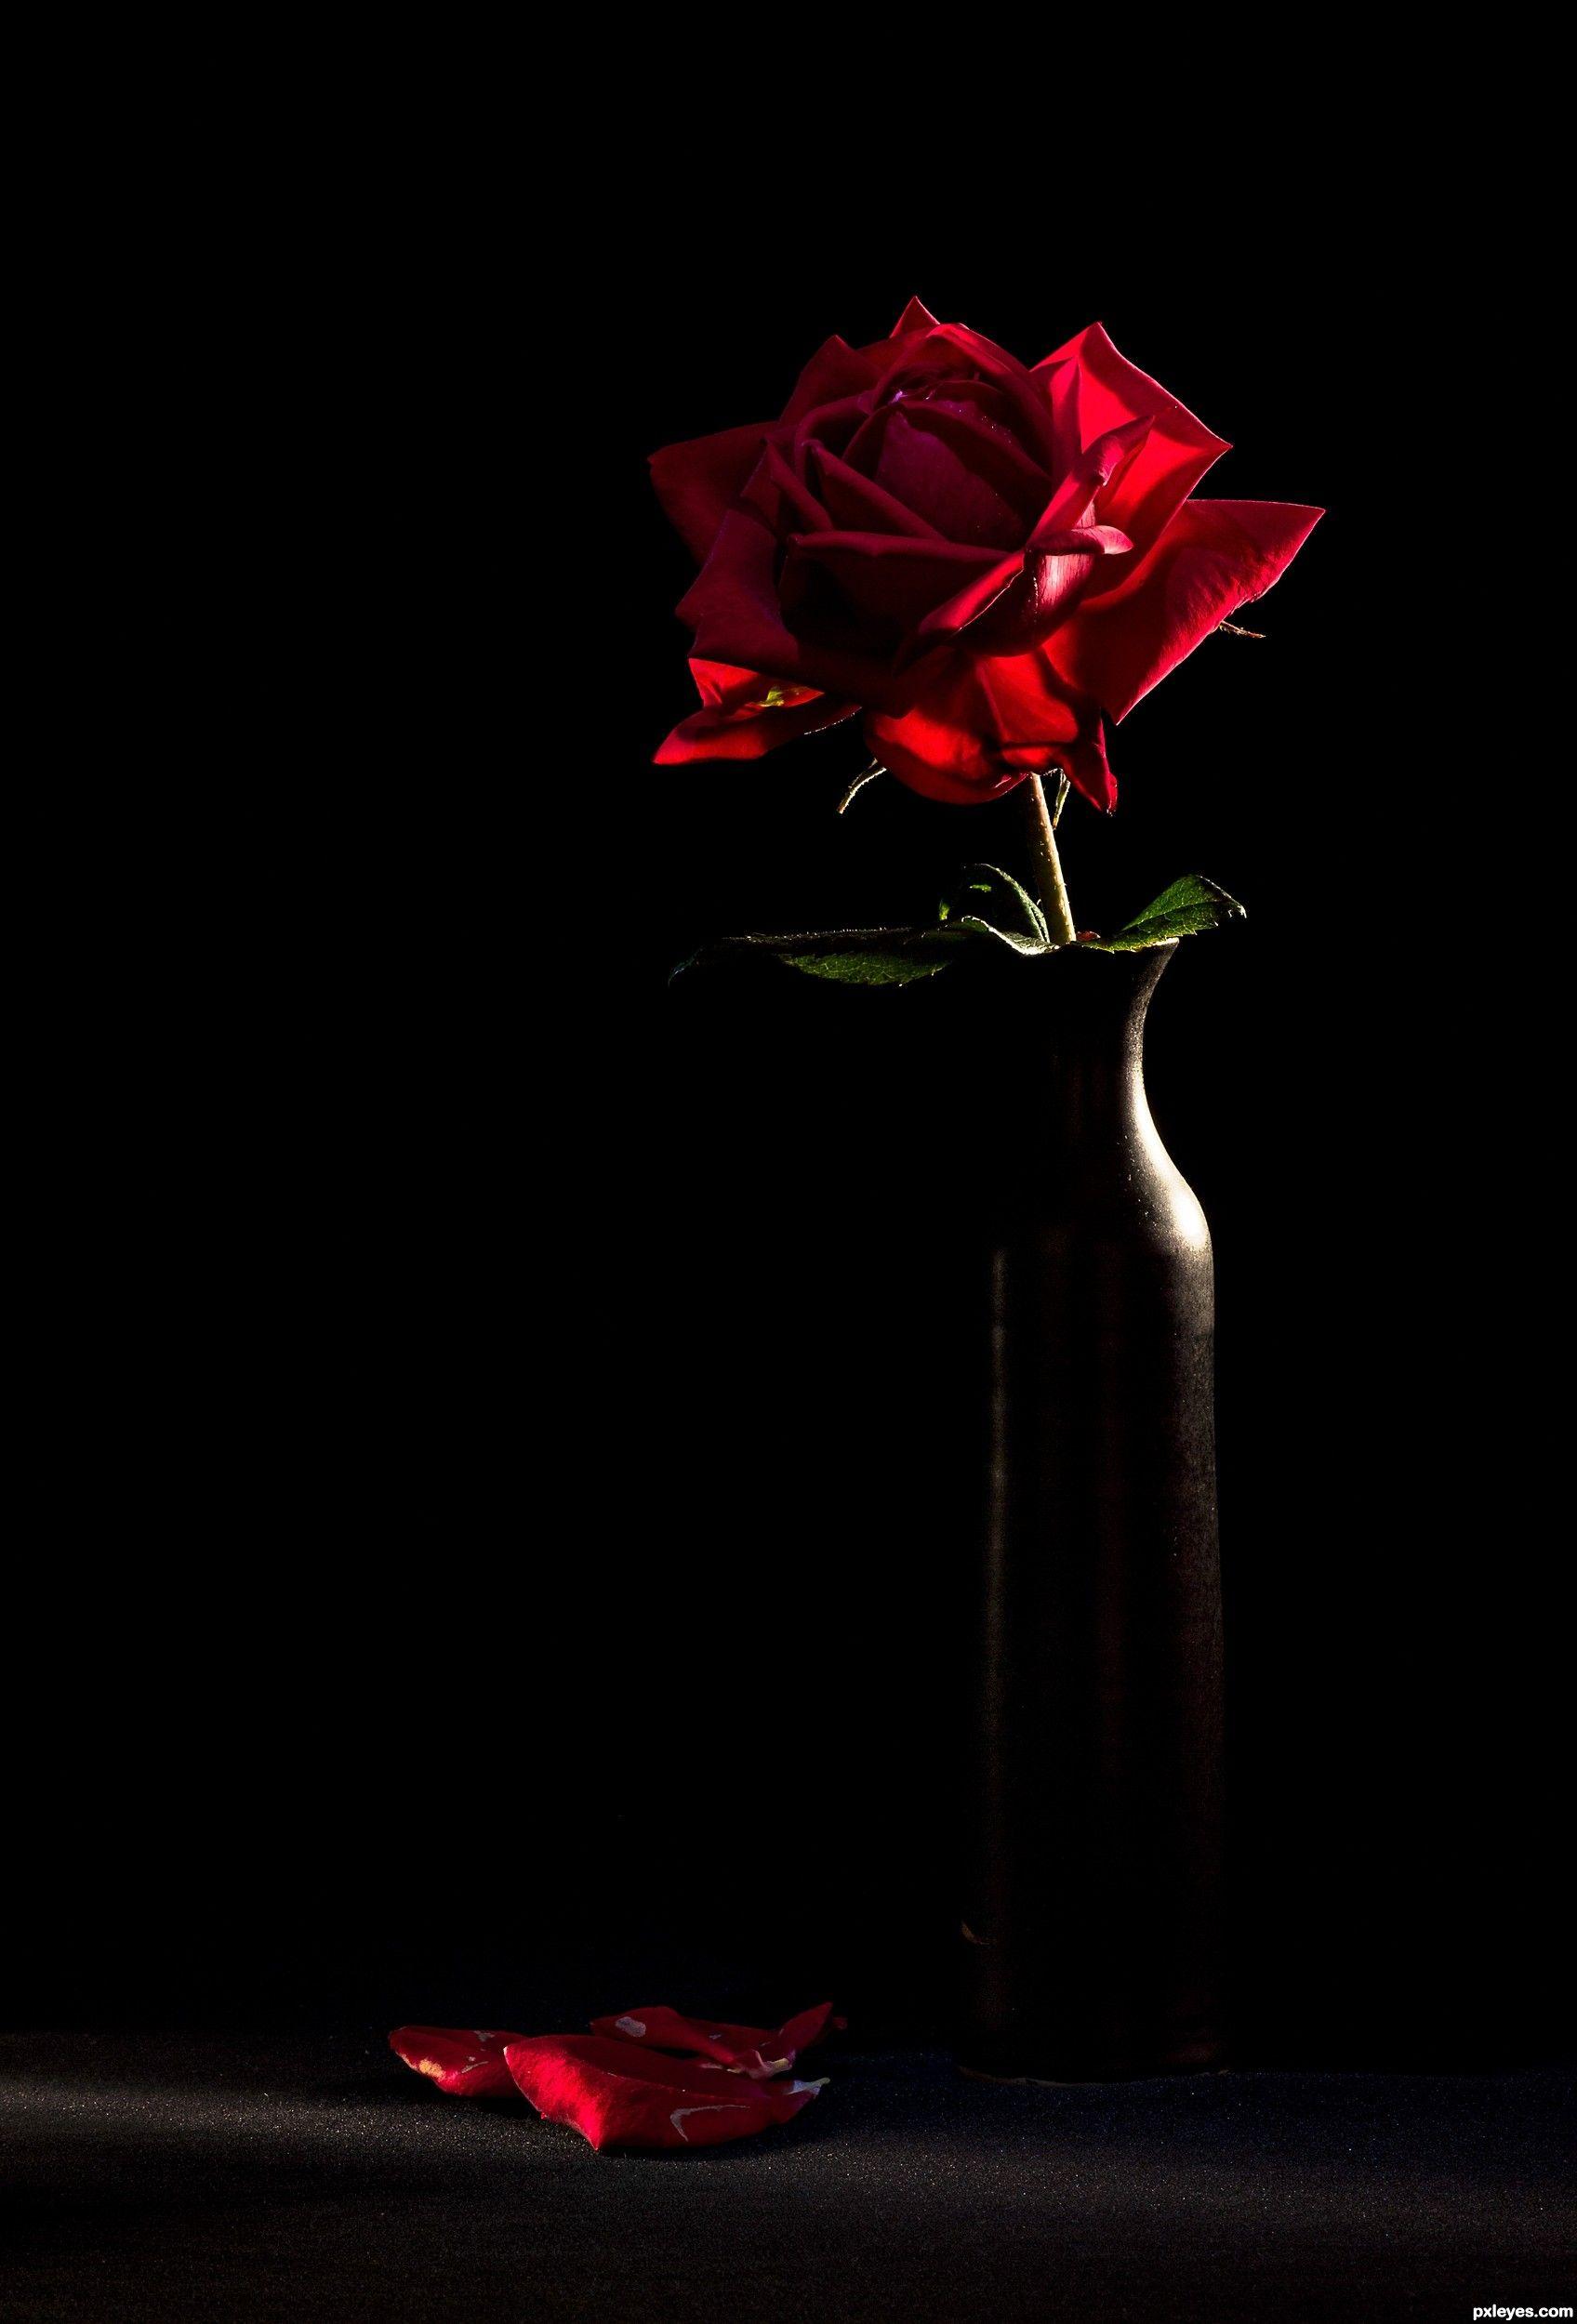 Pin Oleh Moto I Di Roses Mawar Merah Mawar Hitam Fotografi Seni